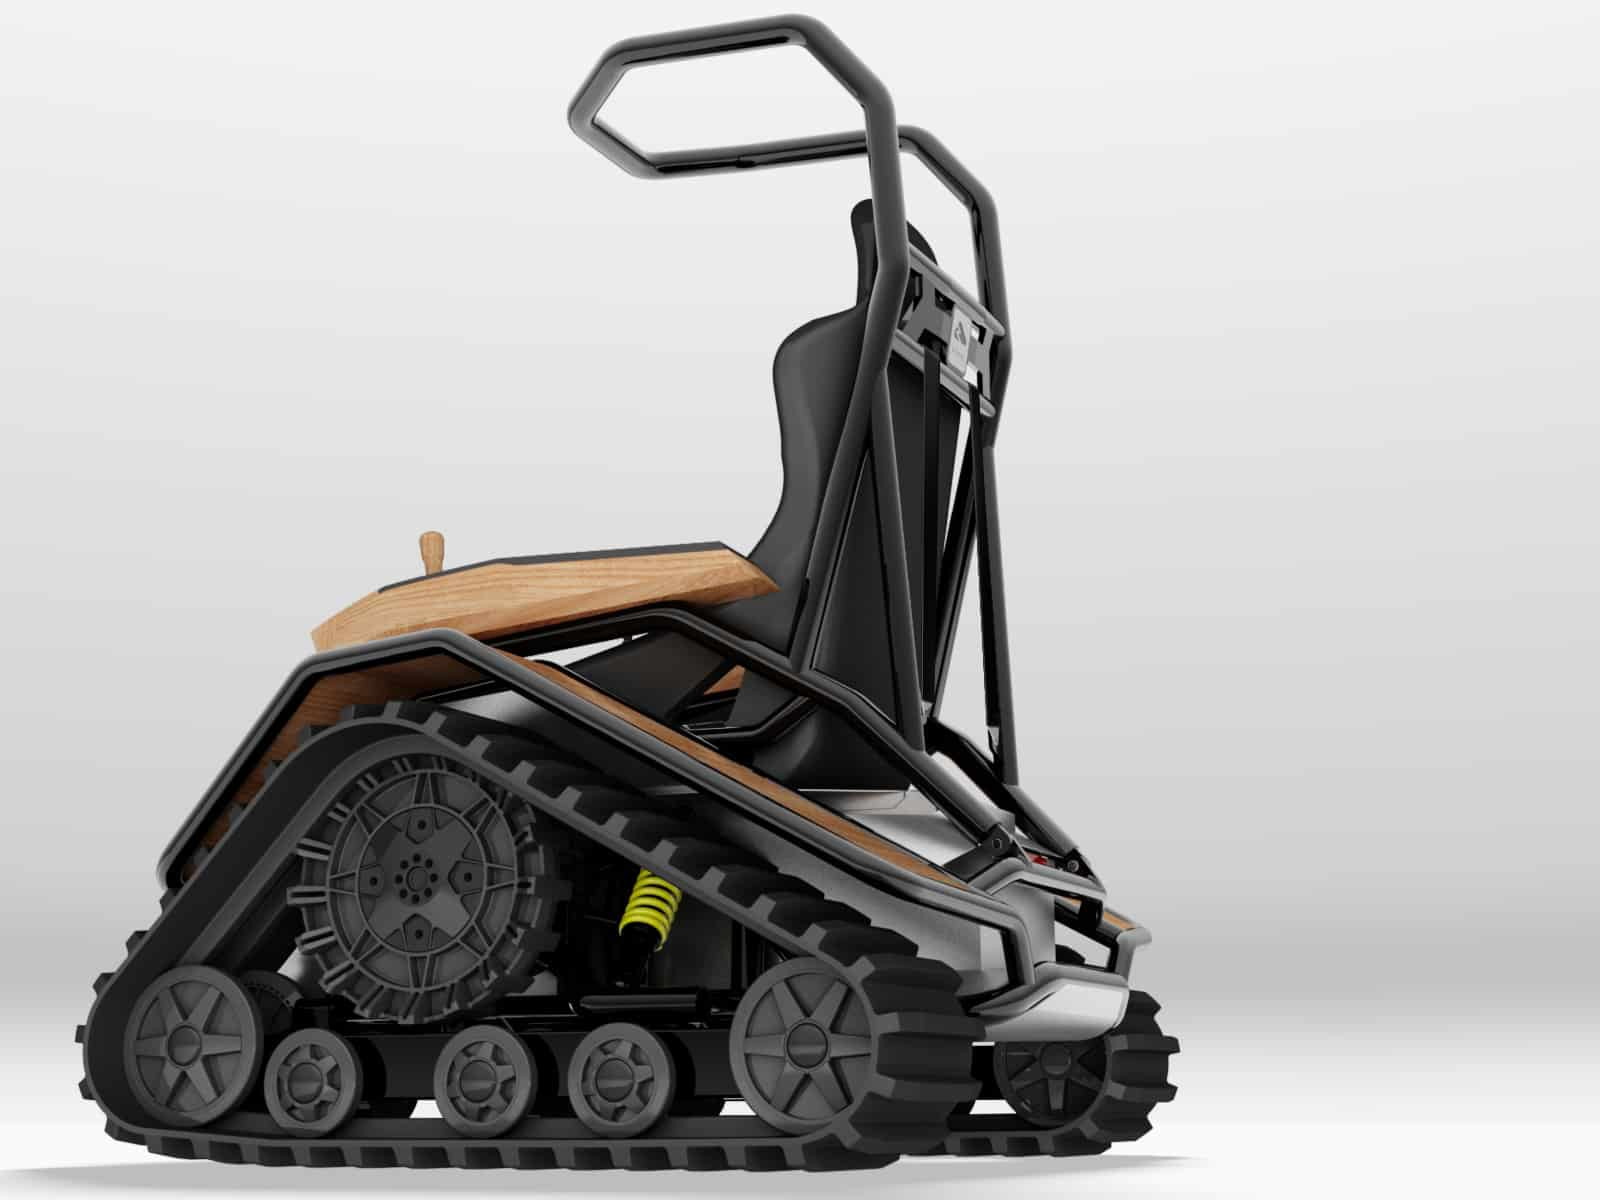 tank chair wheelchair fishing kayak der ziesel off road driving machine noveltystreet